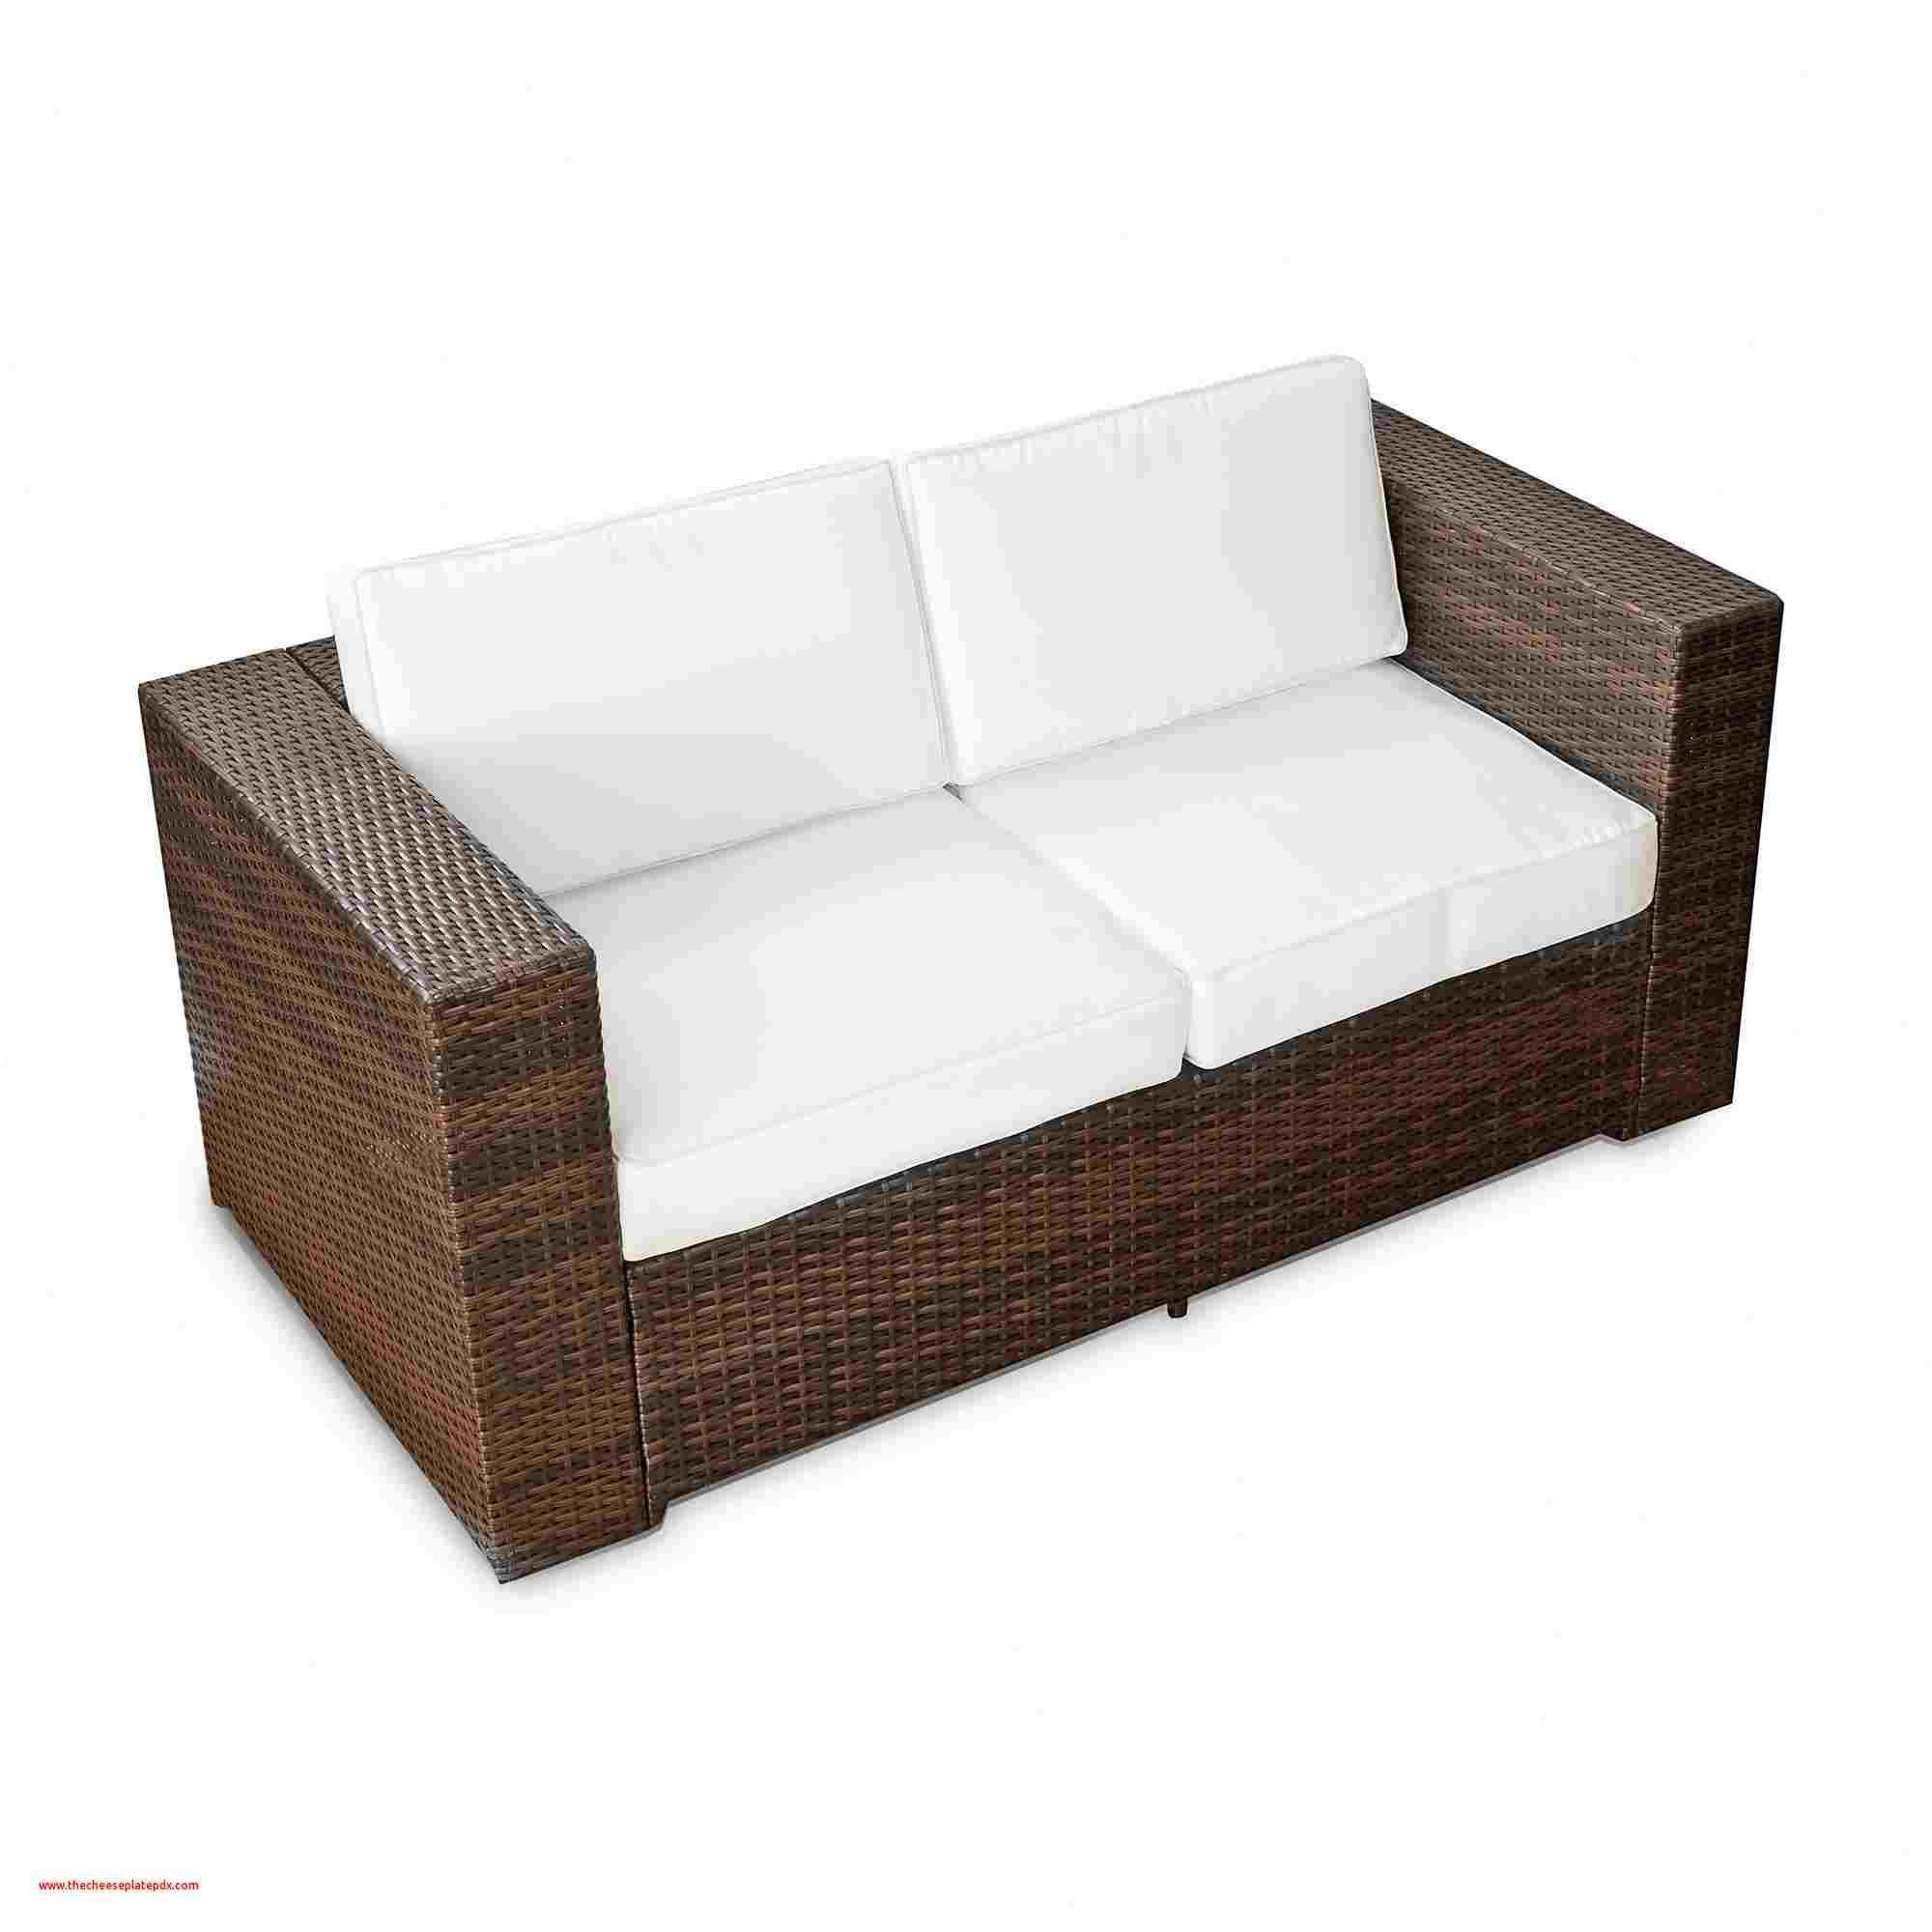 Einzigartig 2 Sitzer Sofa Poco